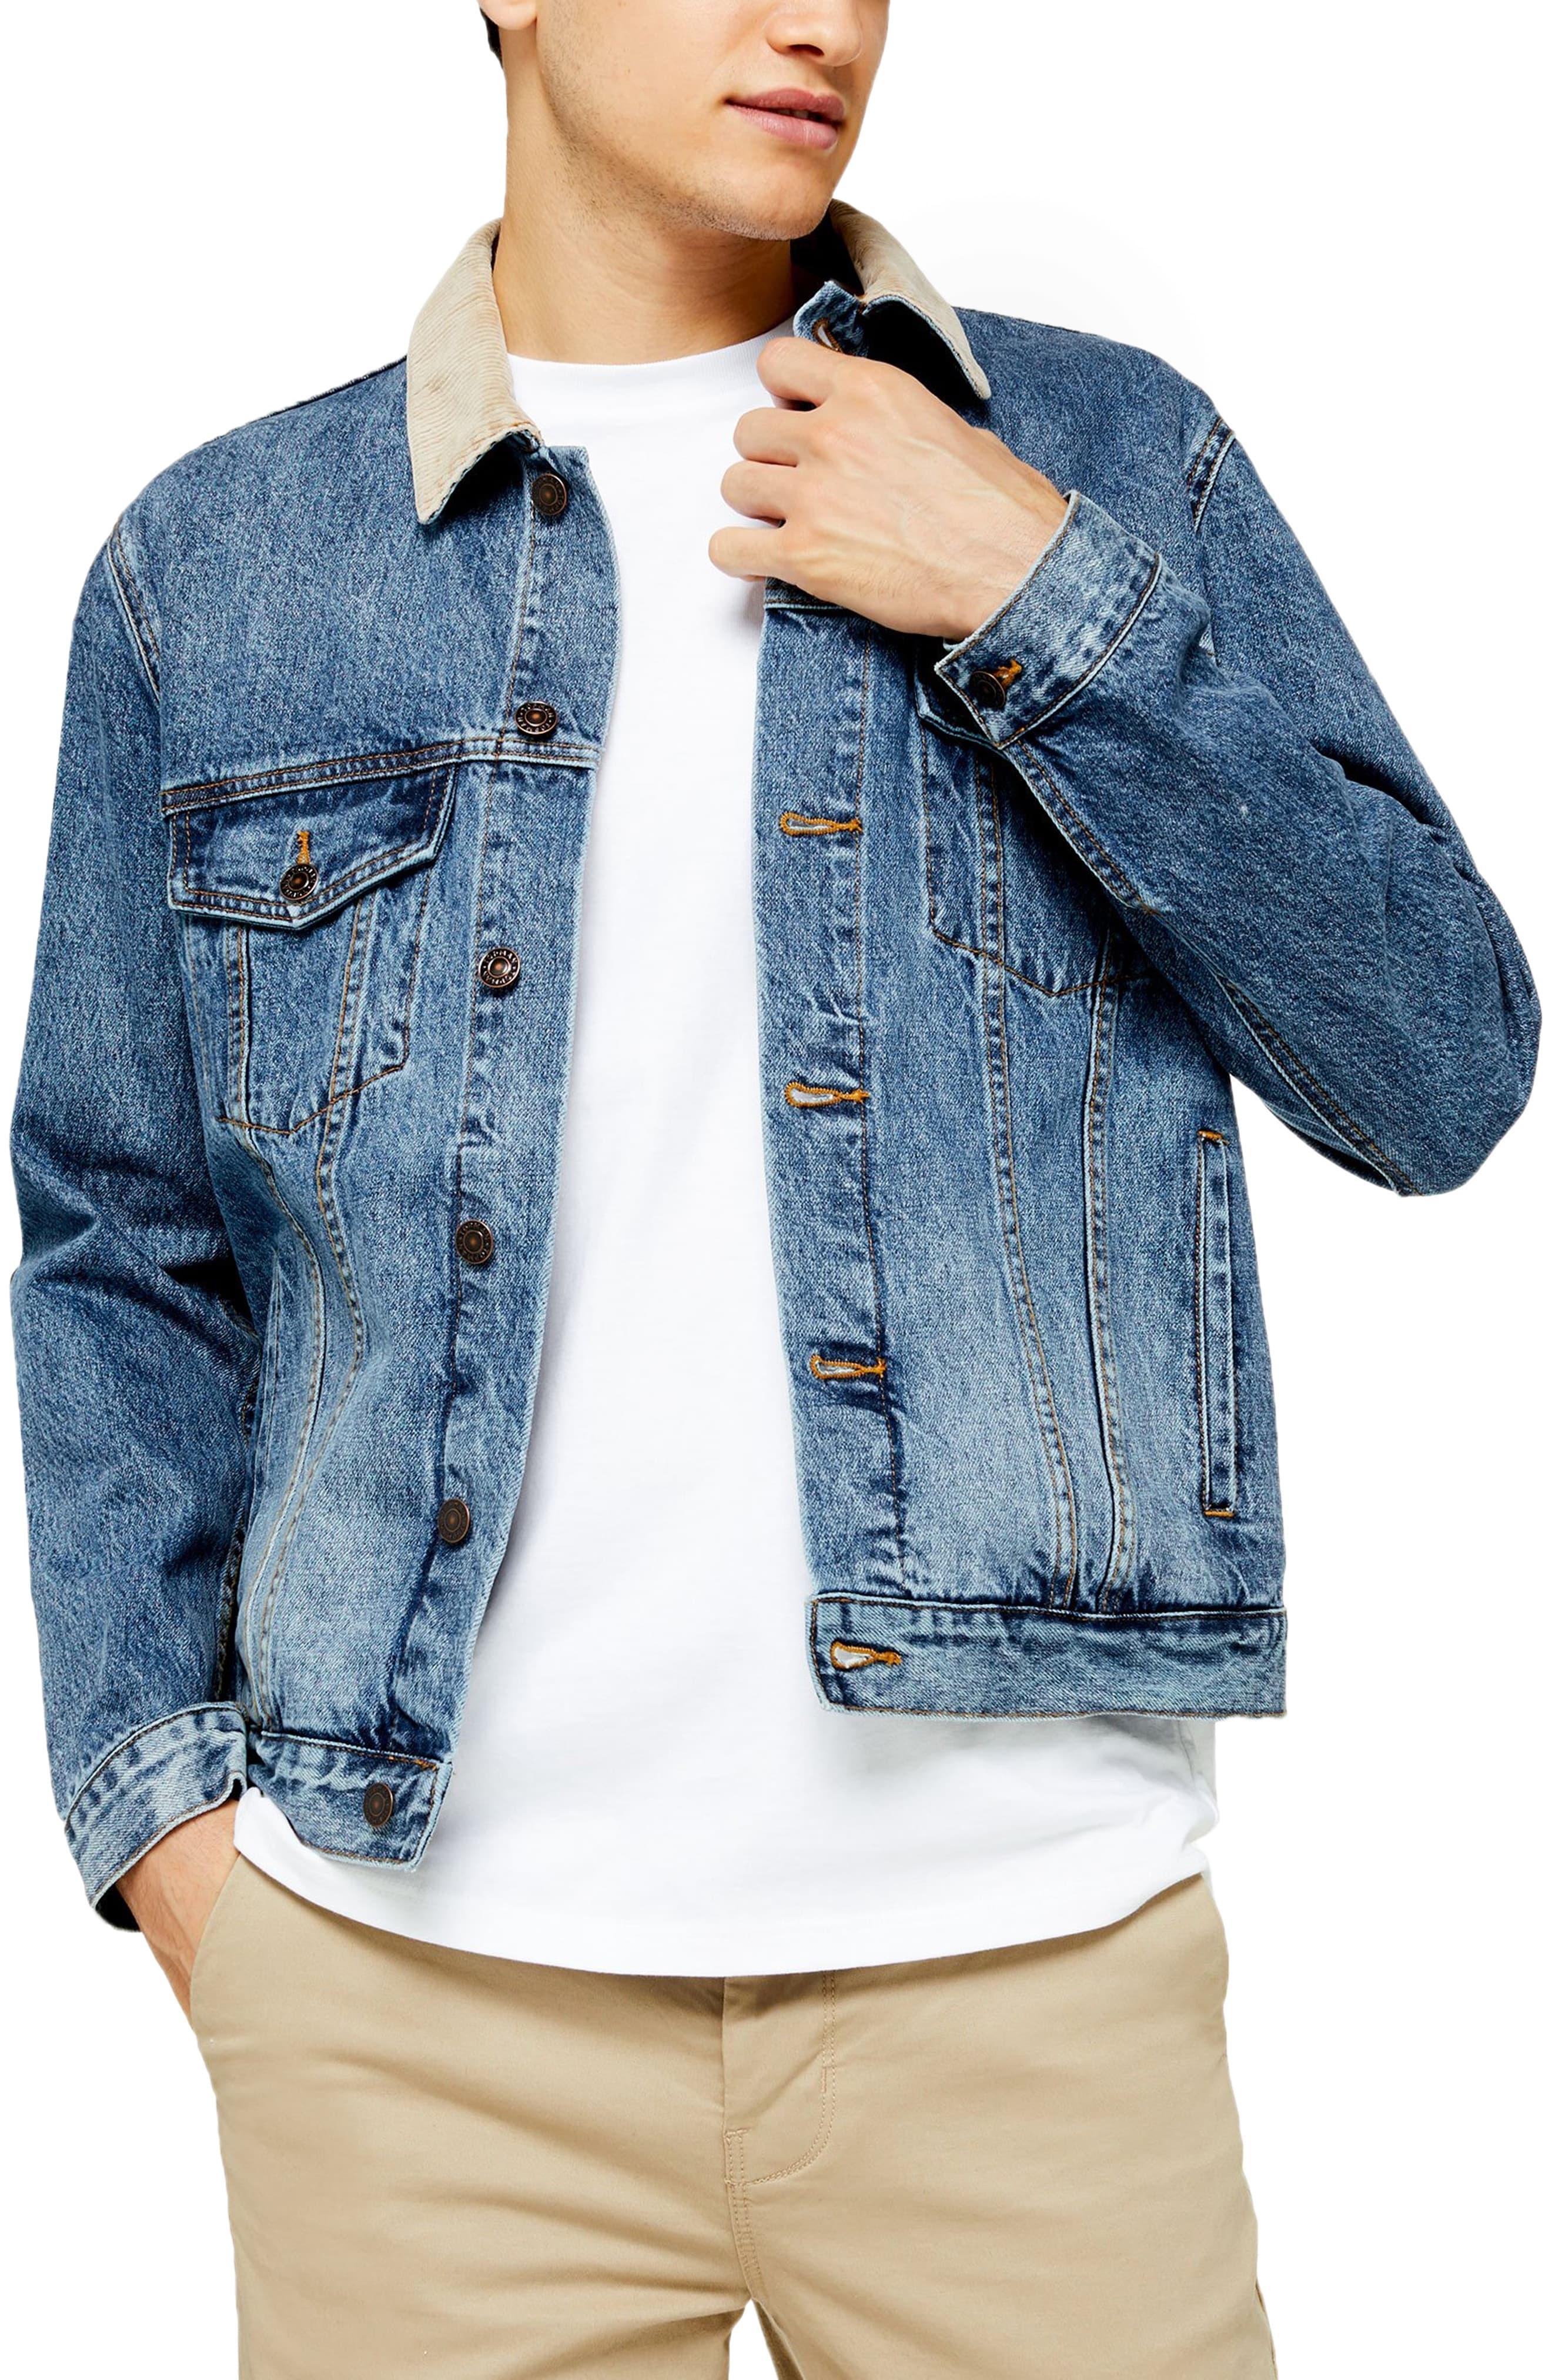 JacketSize Corduroy Men's Classic Fit Collar Denim Blue Large Topman 6yYfgb7